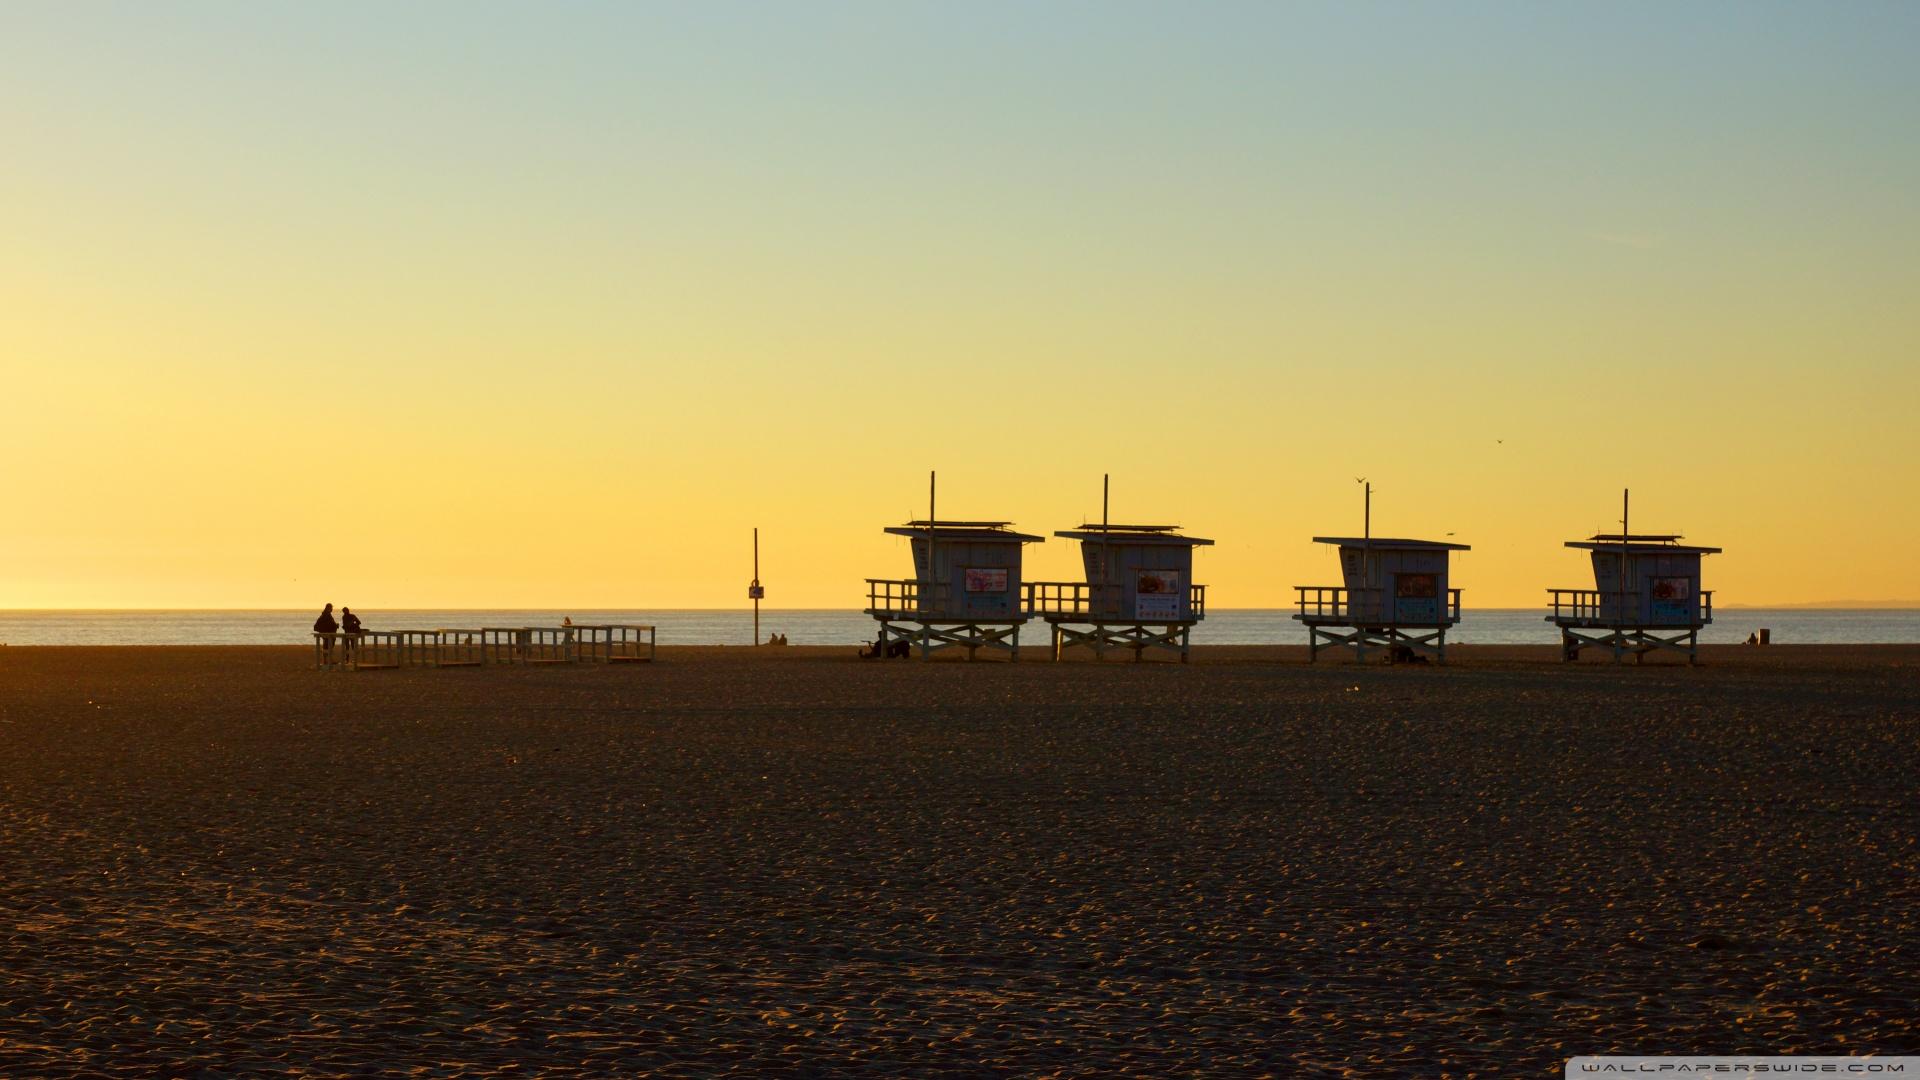 download image venice beach - photo #47